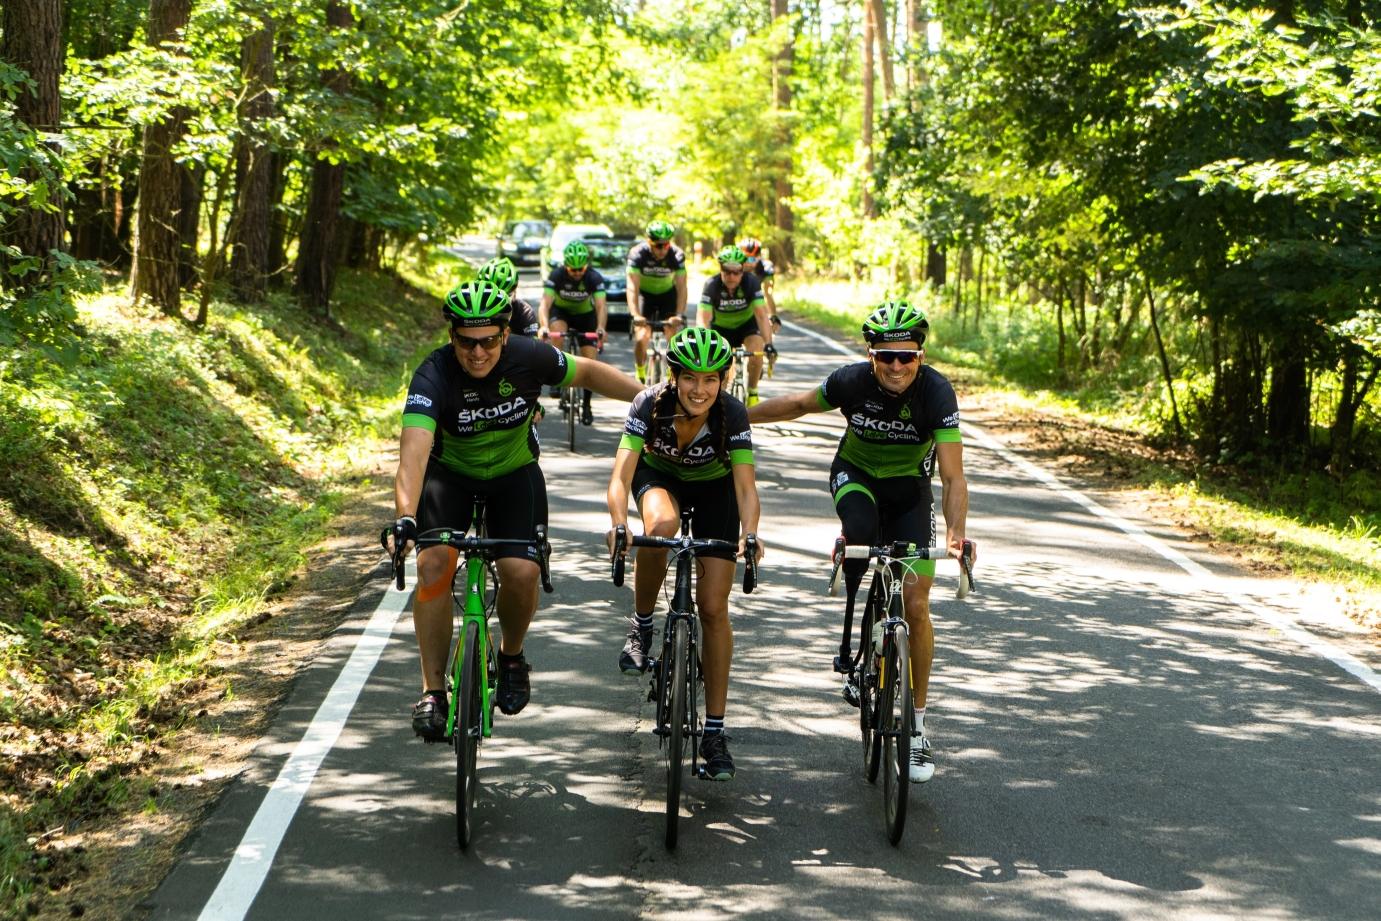 Tým We Love Cycling v závěrečných kilometrech 8. ročníku Metrostav Handy Cyklomaratonu.